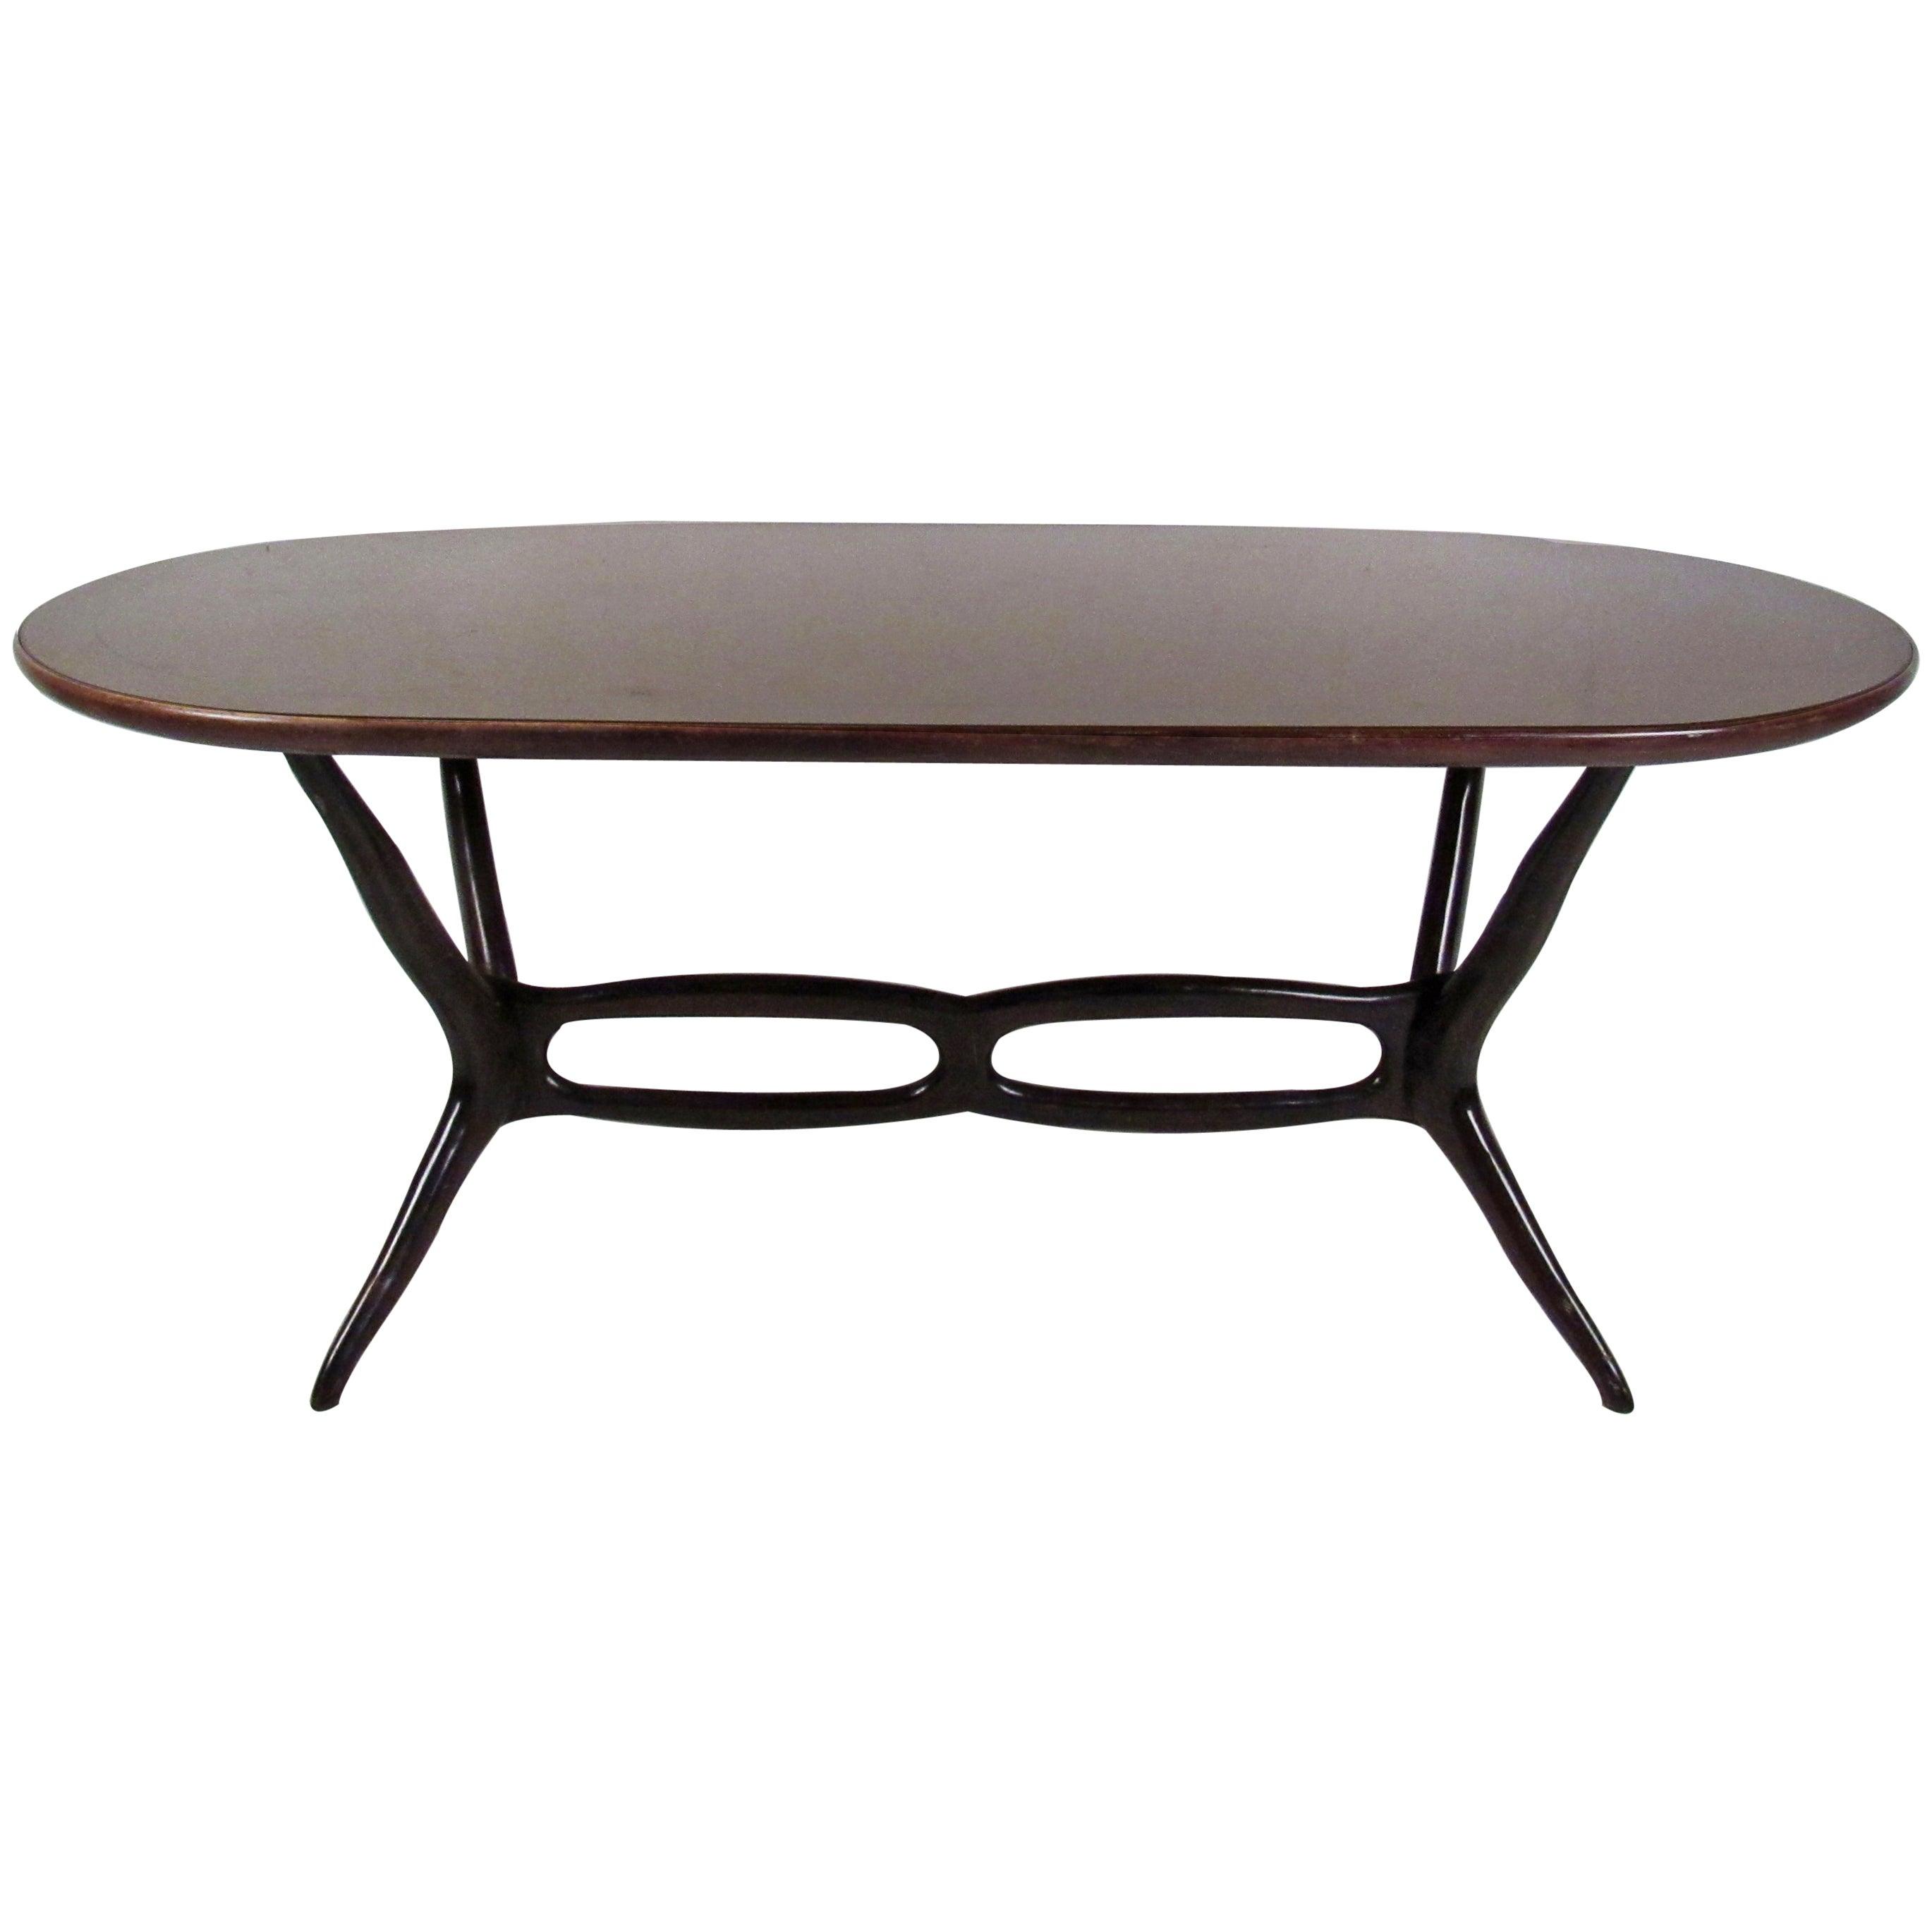 Italian Modern Rosewood Dining Table